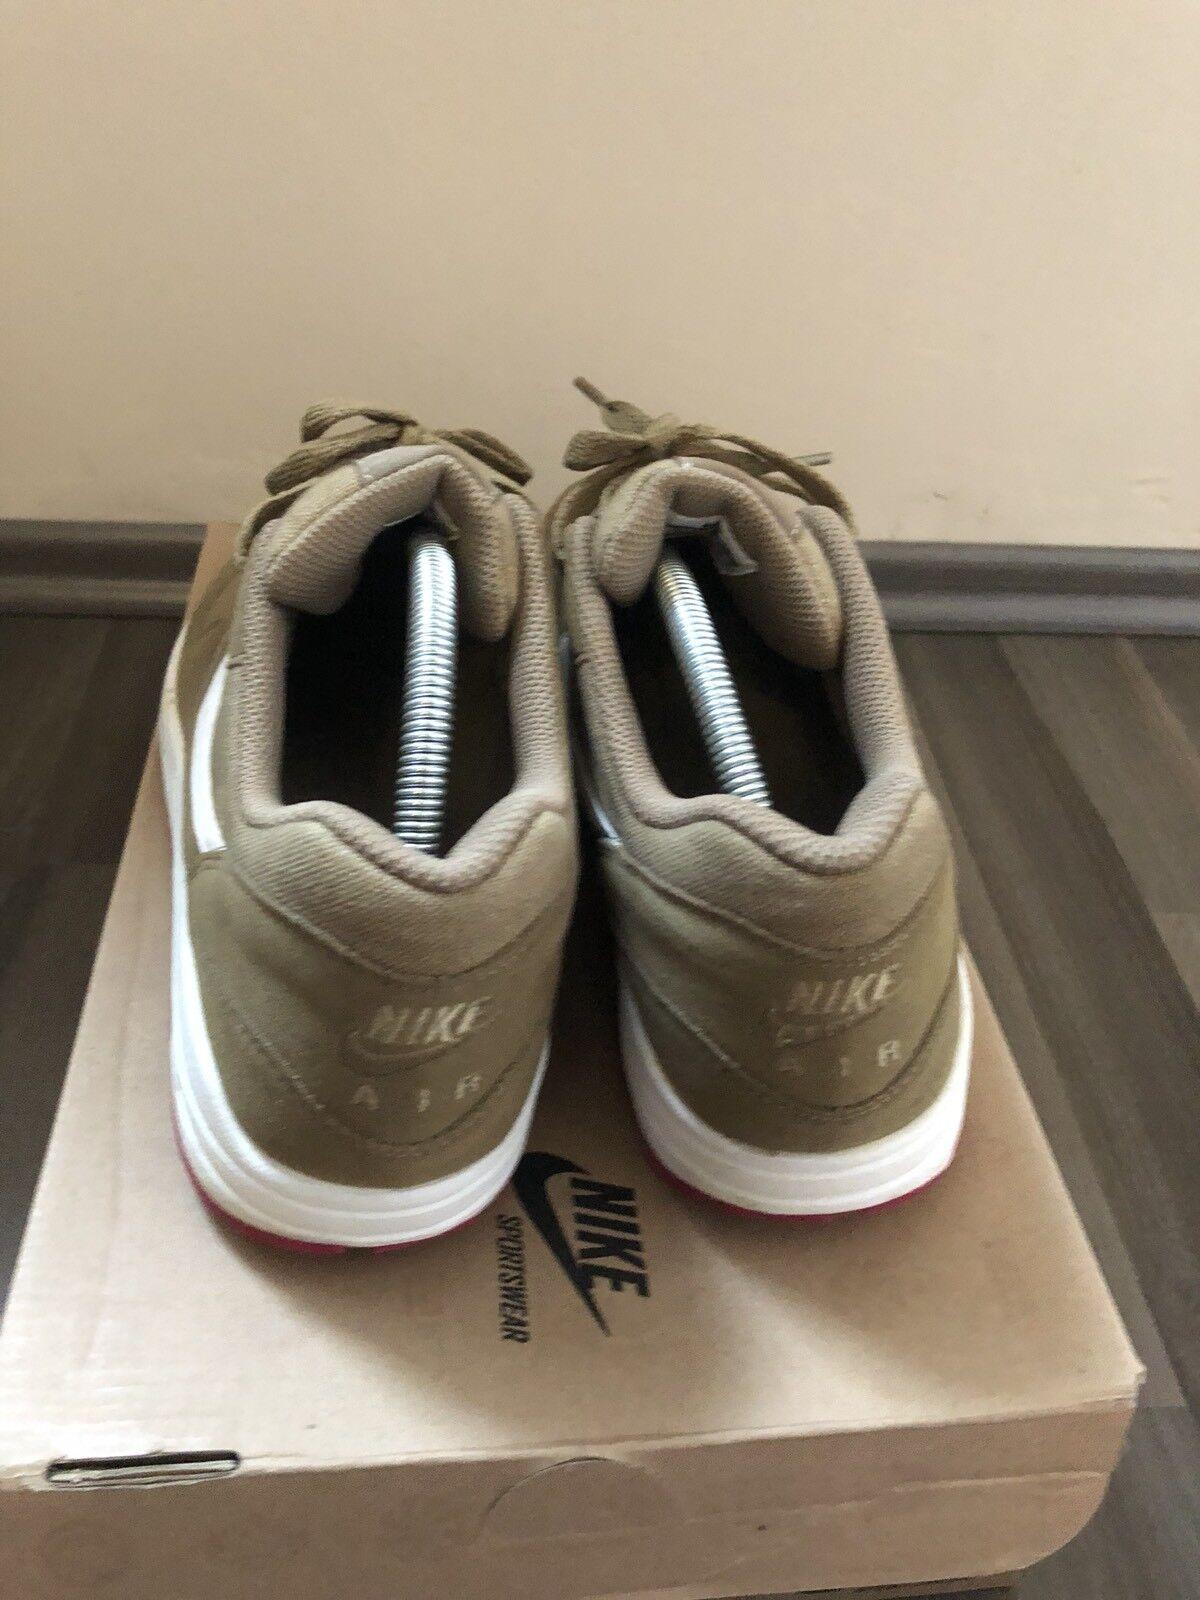 Nike Air Max 1 US9,5 Braun Kelp  Eur43, US9,5 1 Rare Top OG Box 876e3d